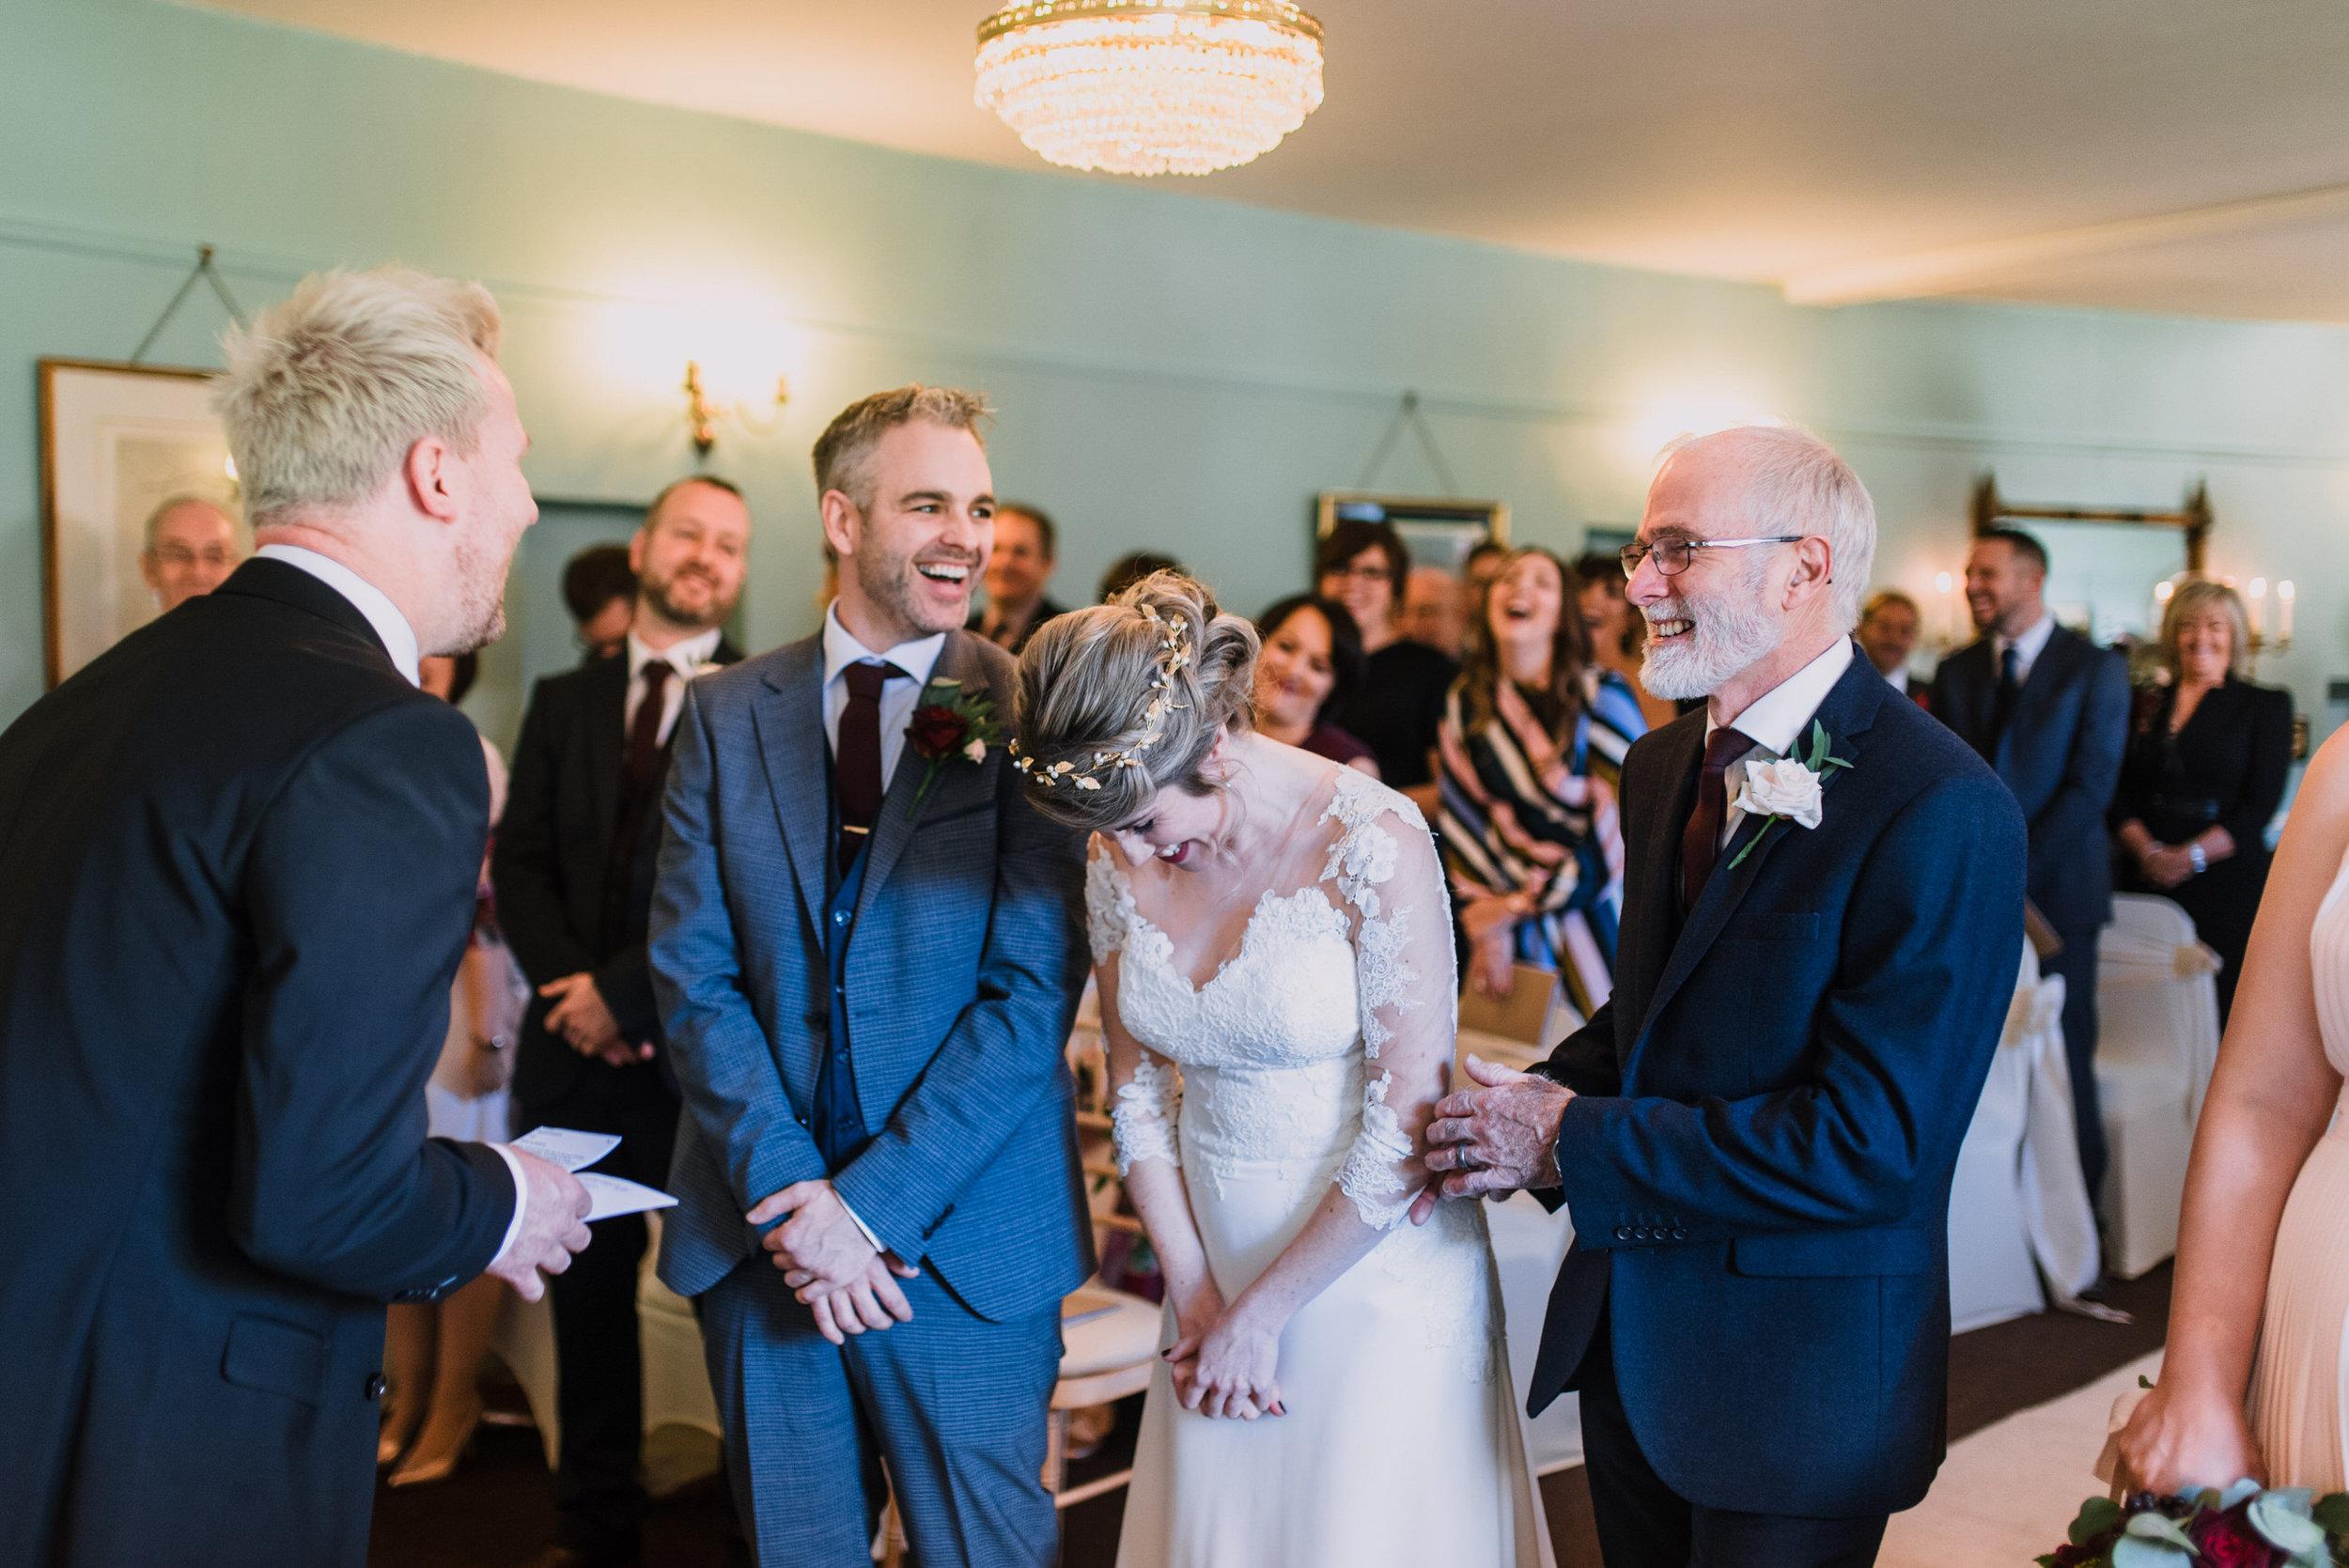 lissanoure castle wedding, northern ireland wedding photographer, romantic northern irish wedding venue, castle wedding ireland, natural wedding photography ni (52).jpg